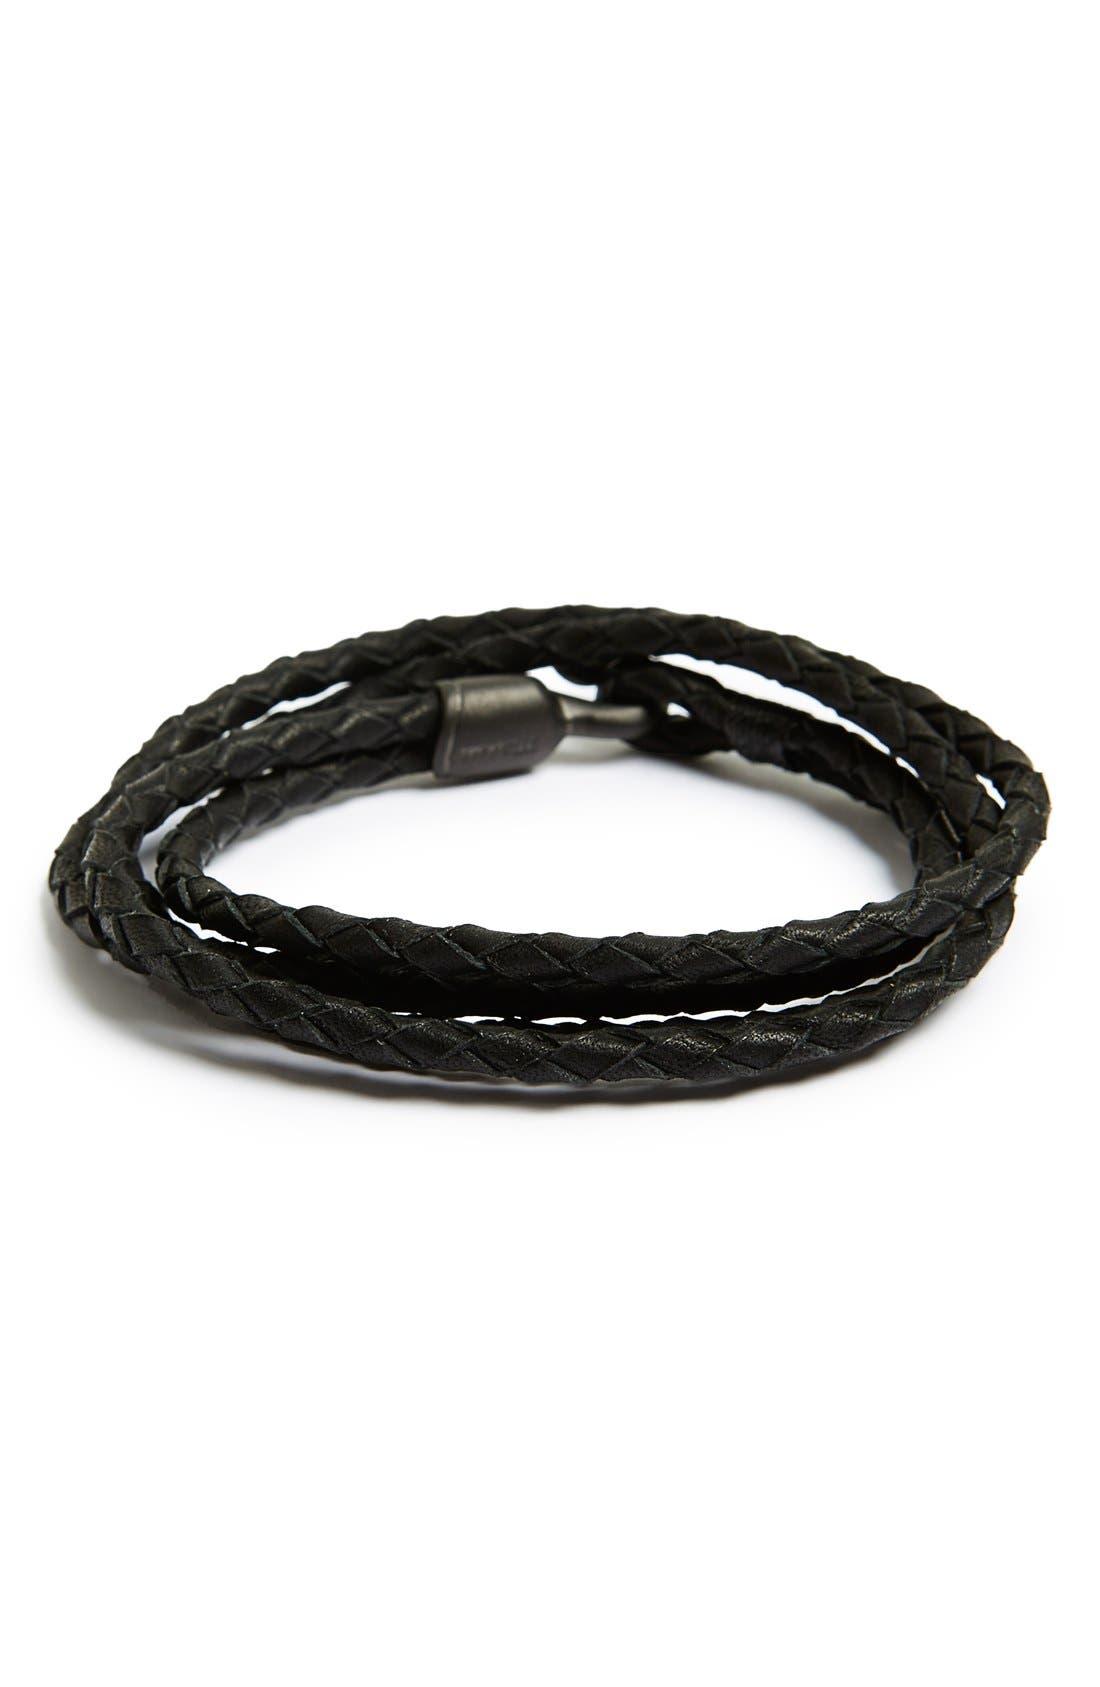 Alternate Image 1 Selected - Miansai 'Trice Noir' Braided Leather Wrap Bracelet